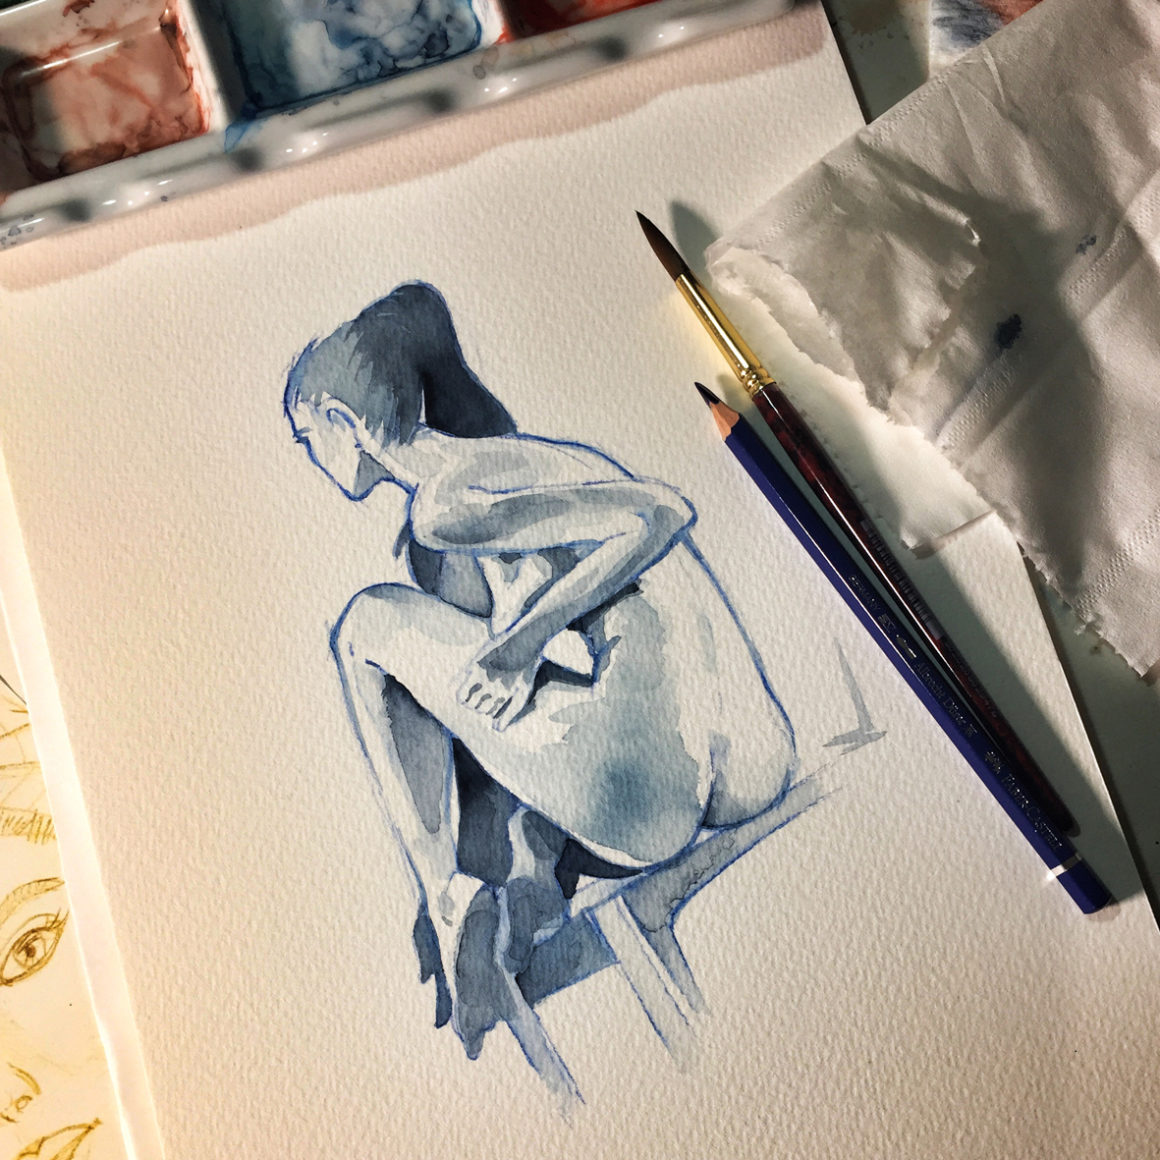 014 Vicktoriia Vito Lentini Designer Acquarelli Sketches